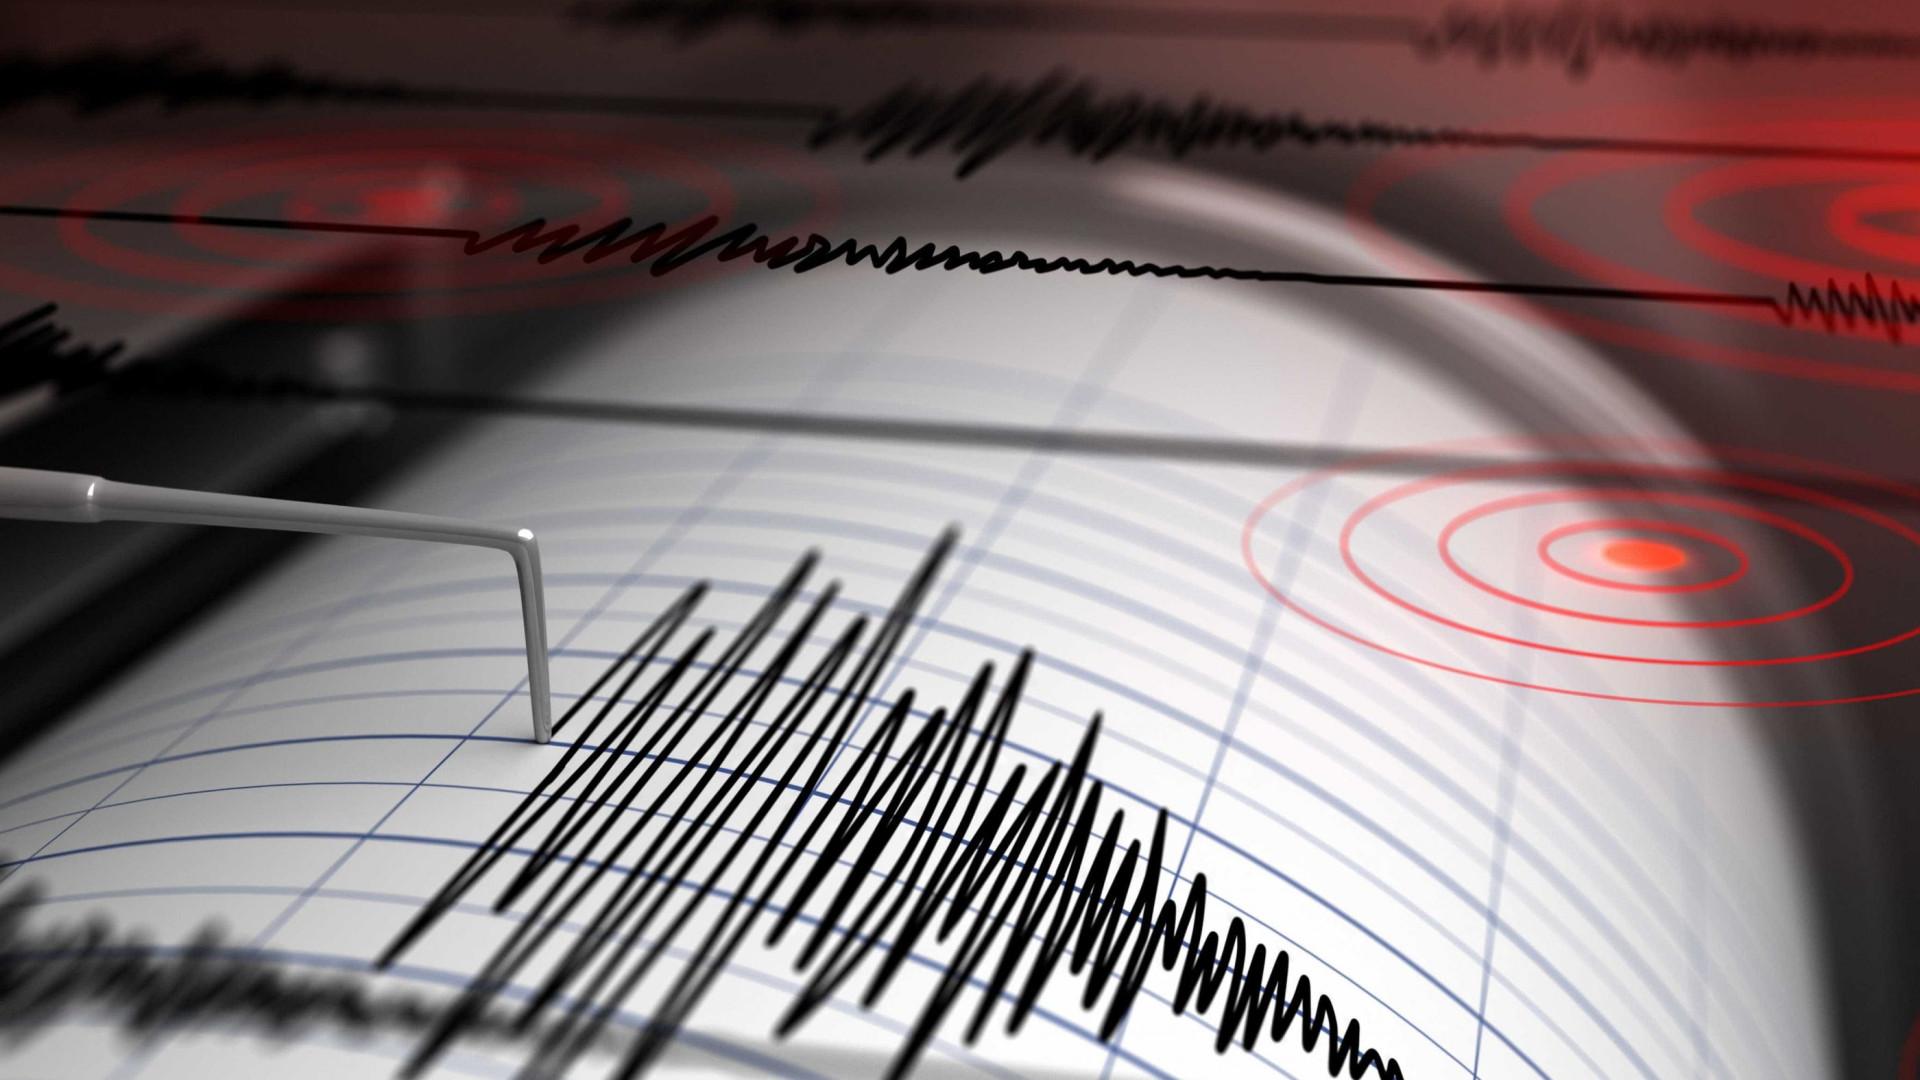 Sismo de magnitude 5,3 atinge o Chile